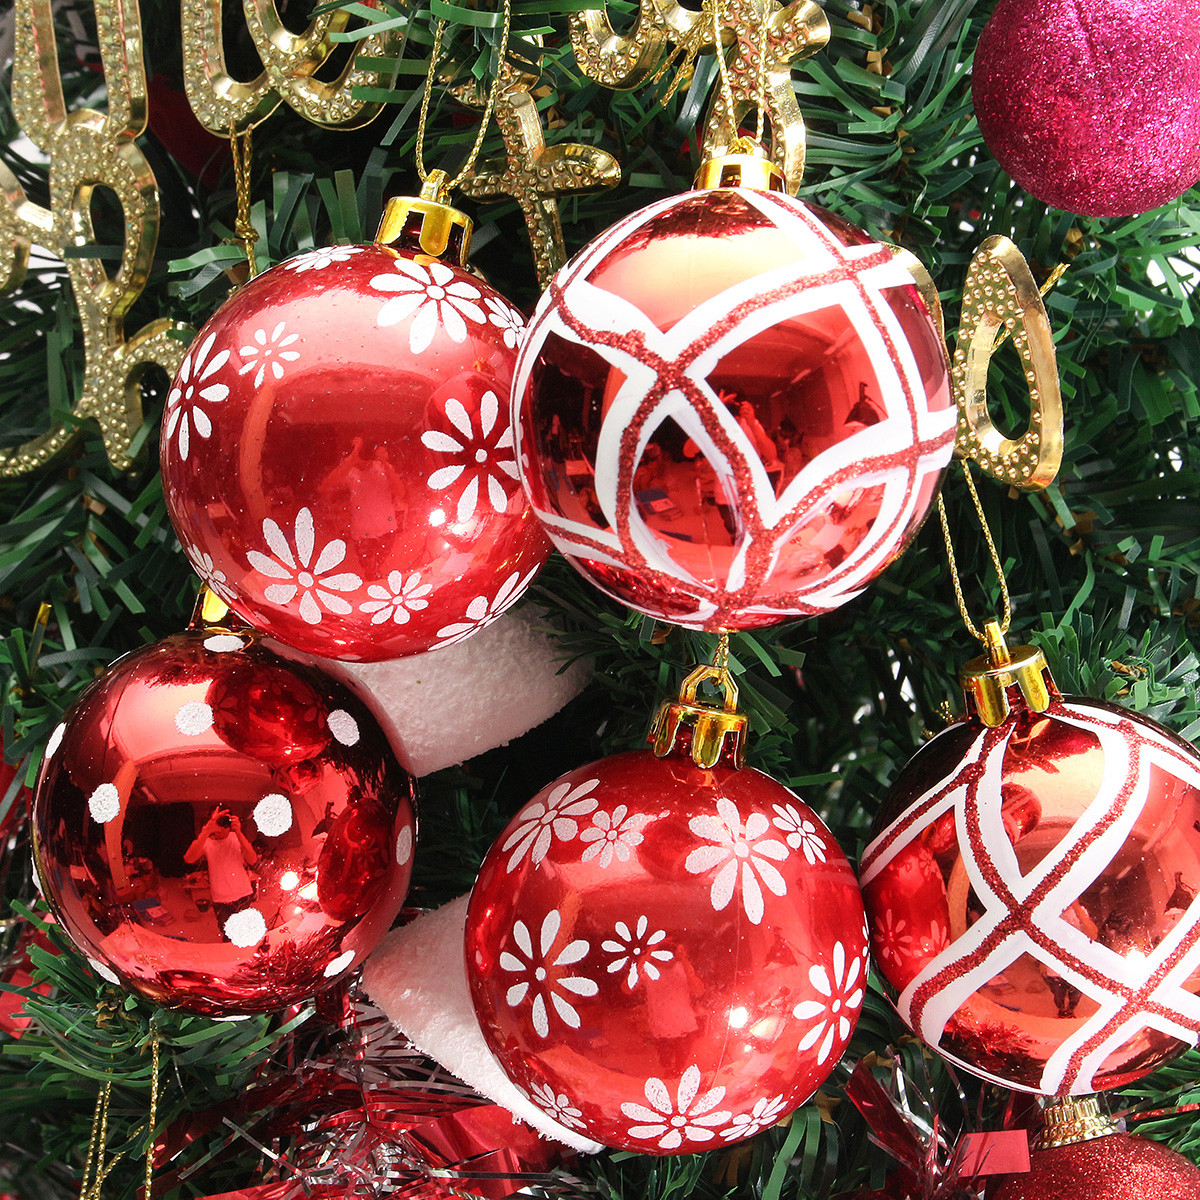 Plastic Christmas Baubles Handmade & Painted Ball Tree Balls Decorations 6/24PCS - Photo: 6